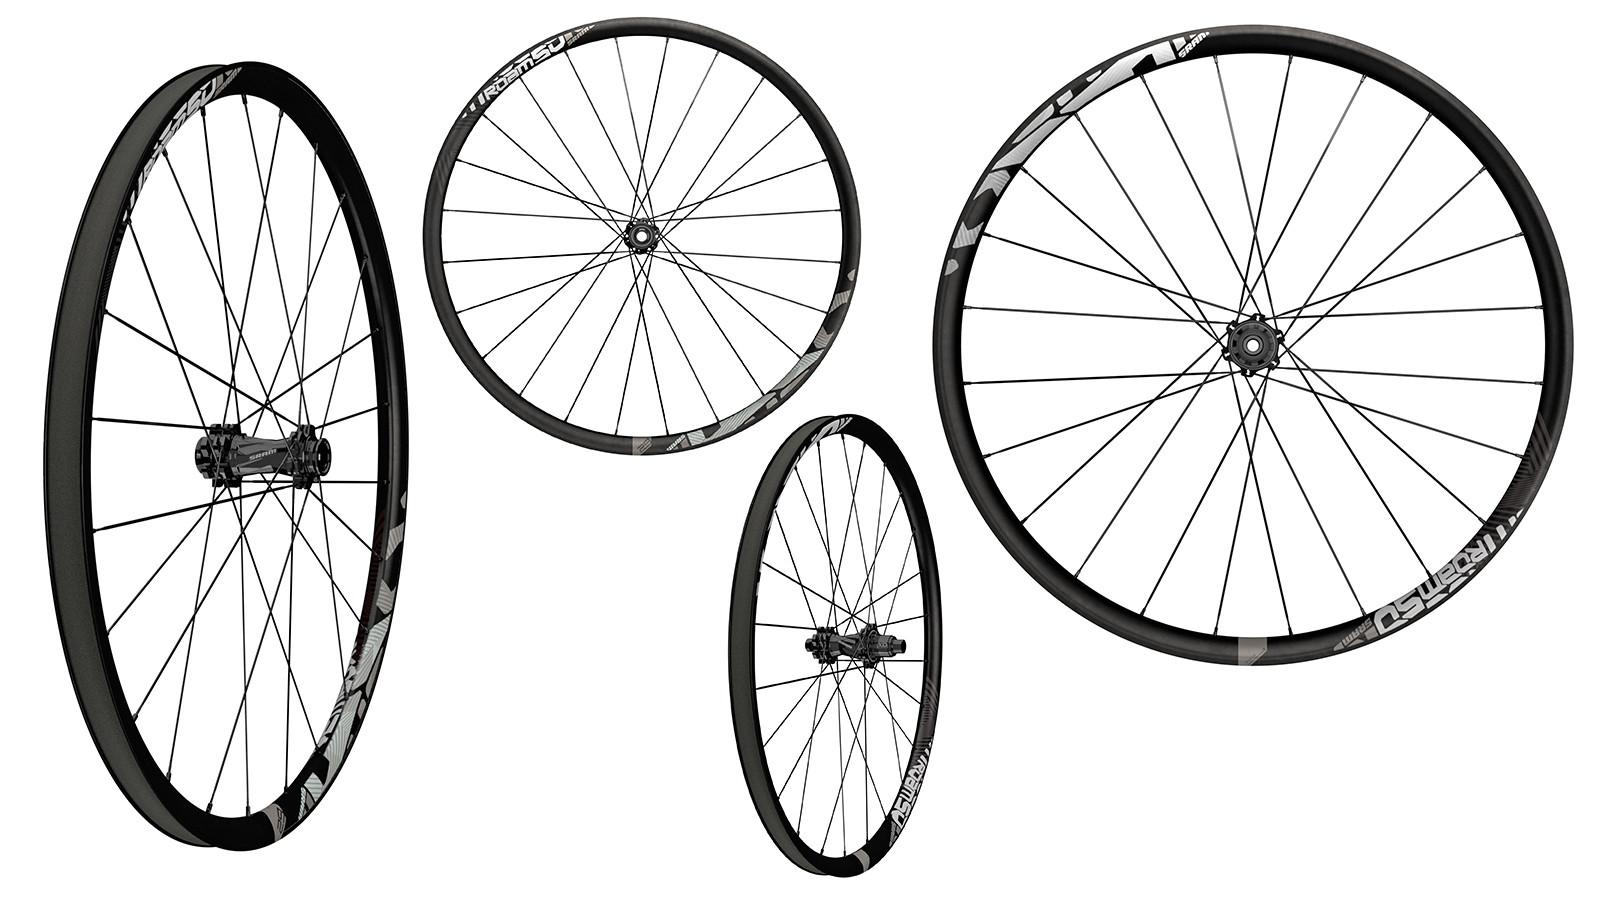 4e69792b4f0 New SRAM MTB ROAM 50 Wheels | Everyday Carbon Champ - Mountain Bikes ...